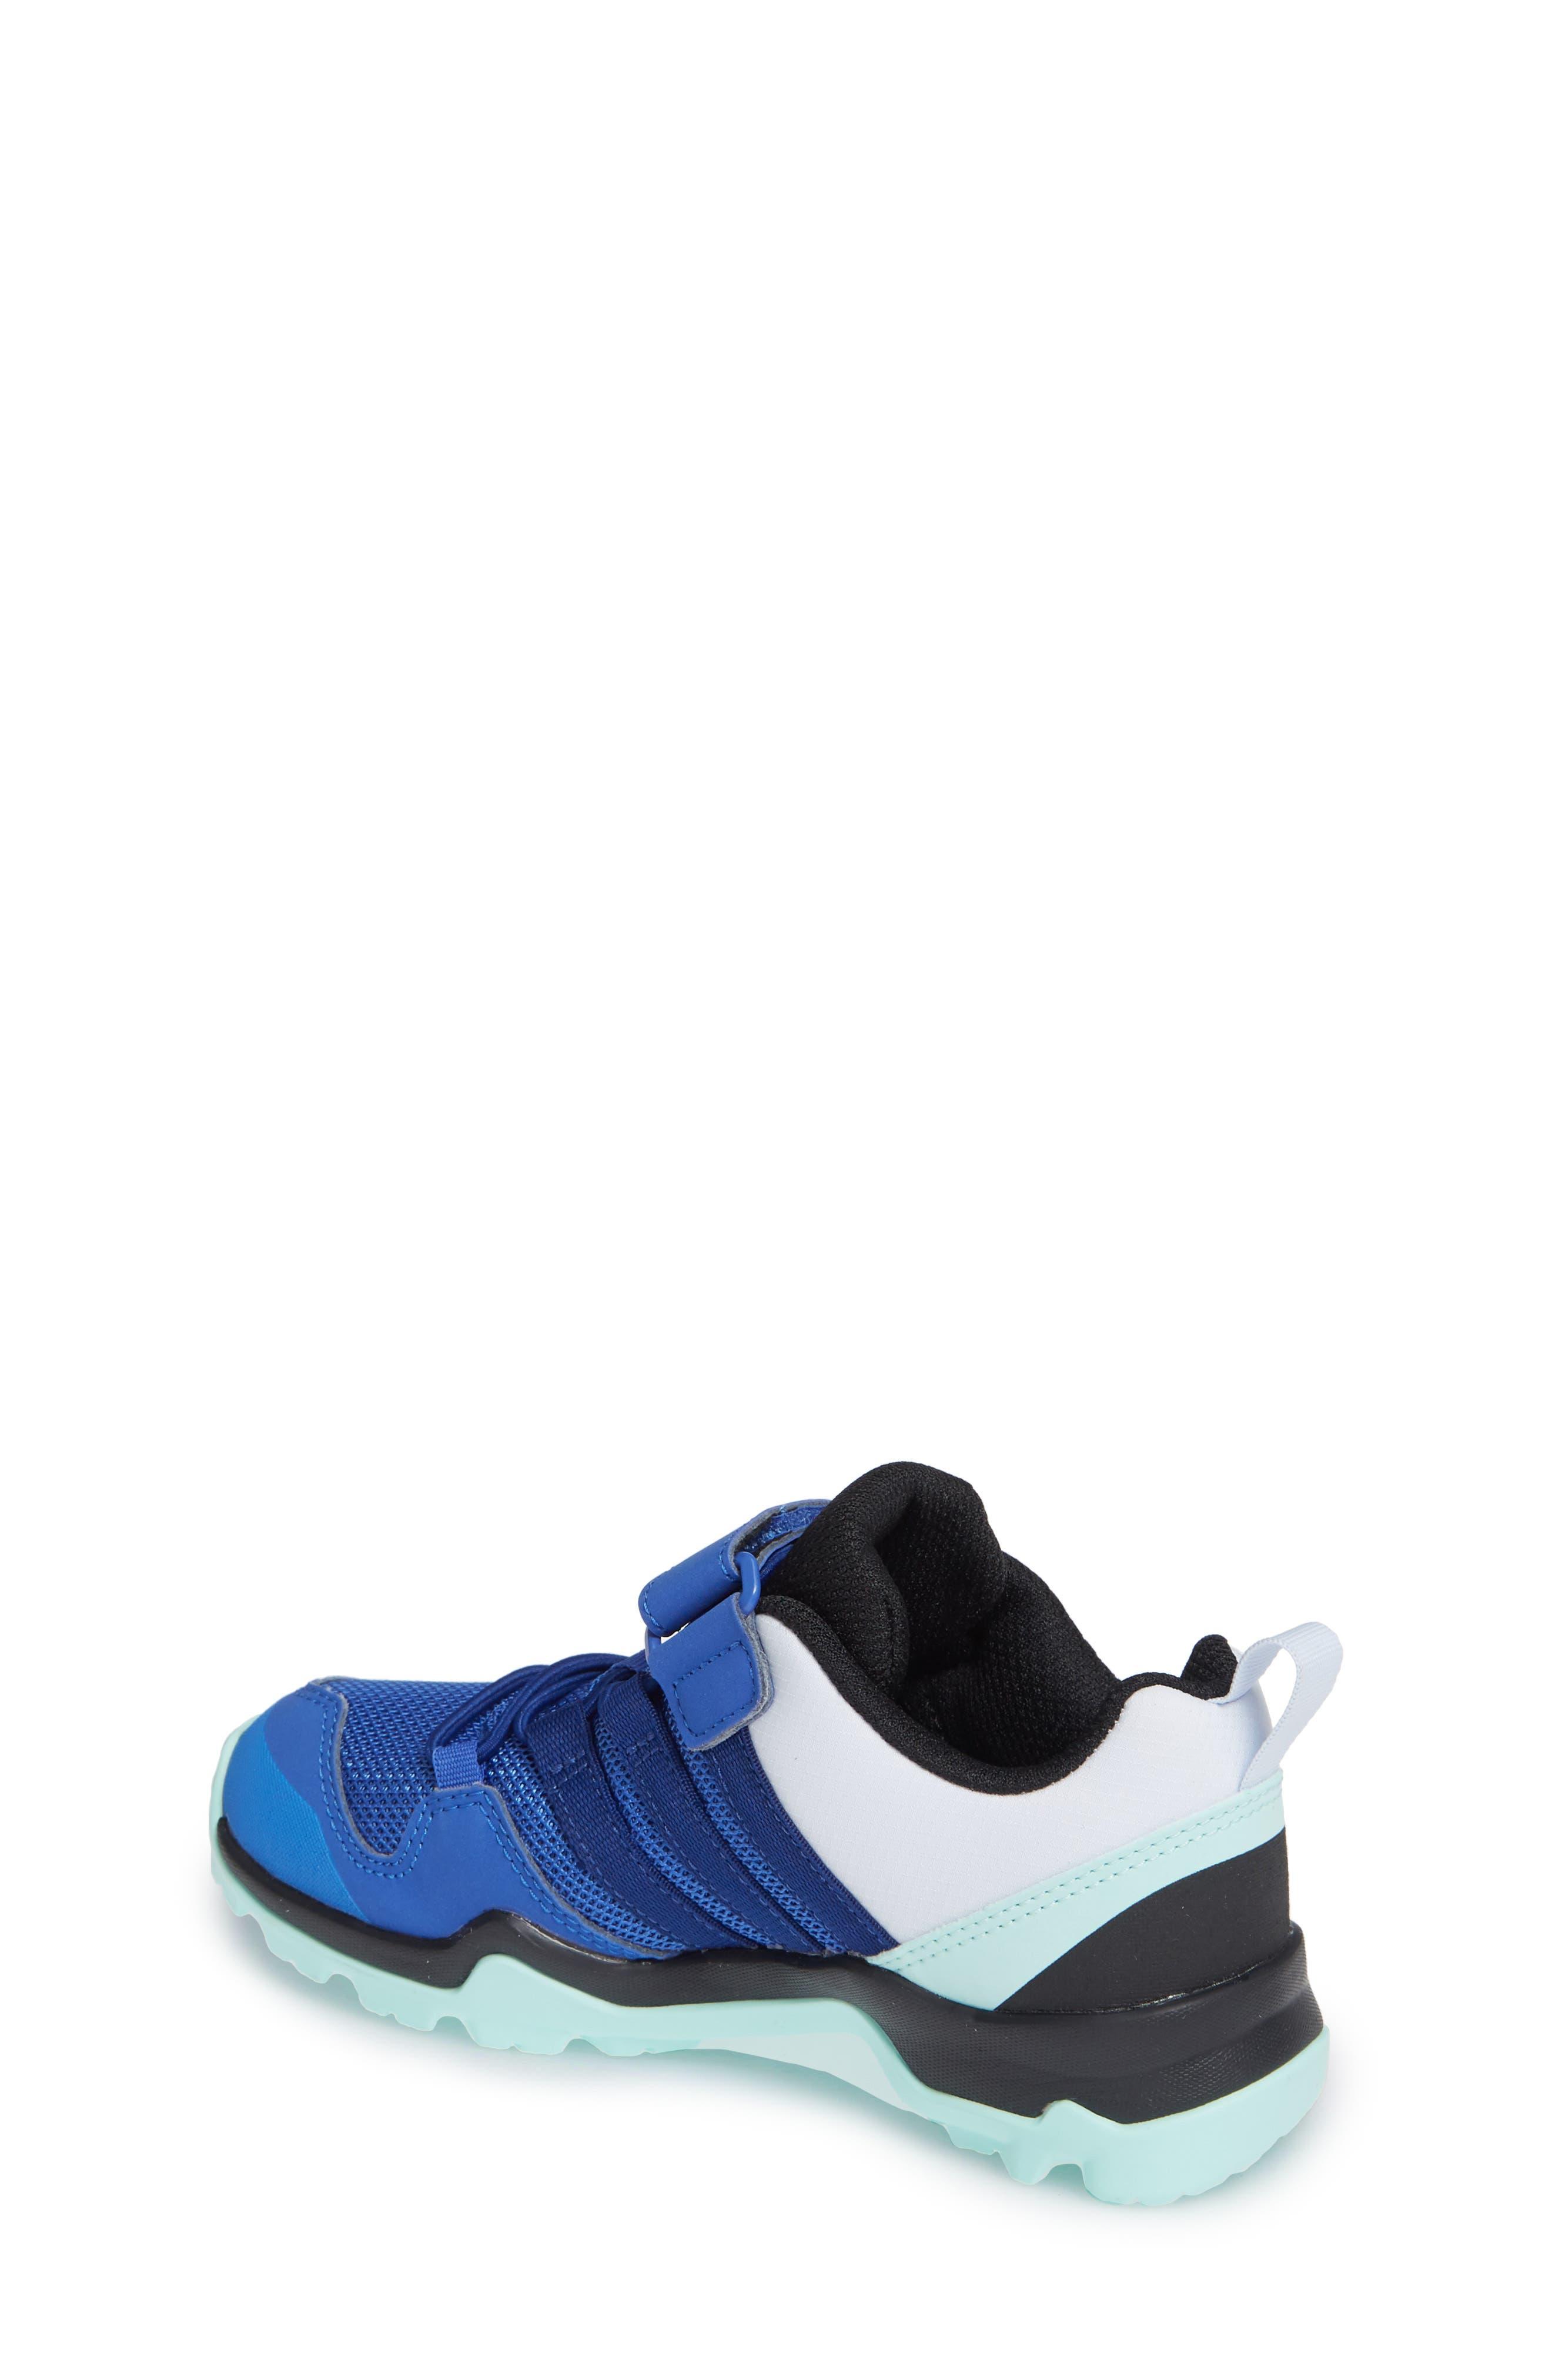 Terrex AX2R Sneaker,                             Alternate thumbnail 2, color,                             HI-RES BLUE/ MYSTERY INK/ MINT